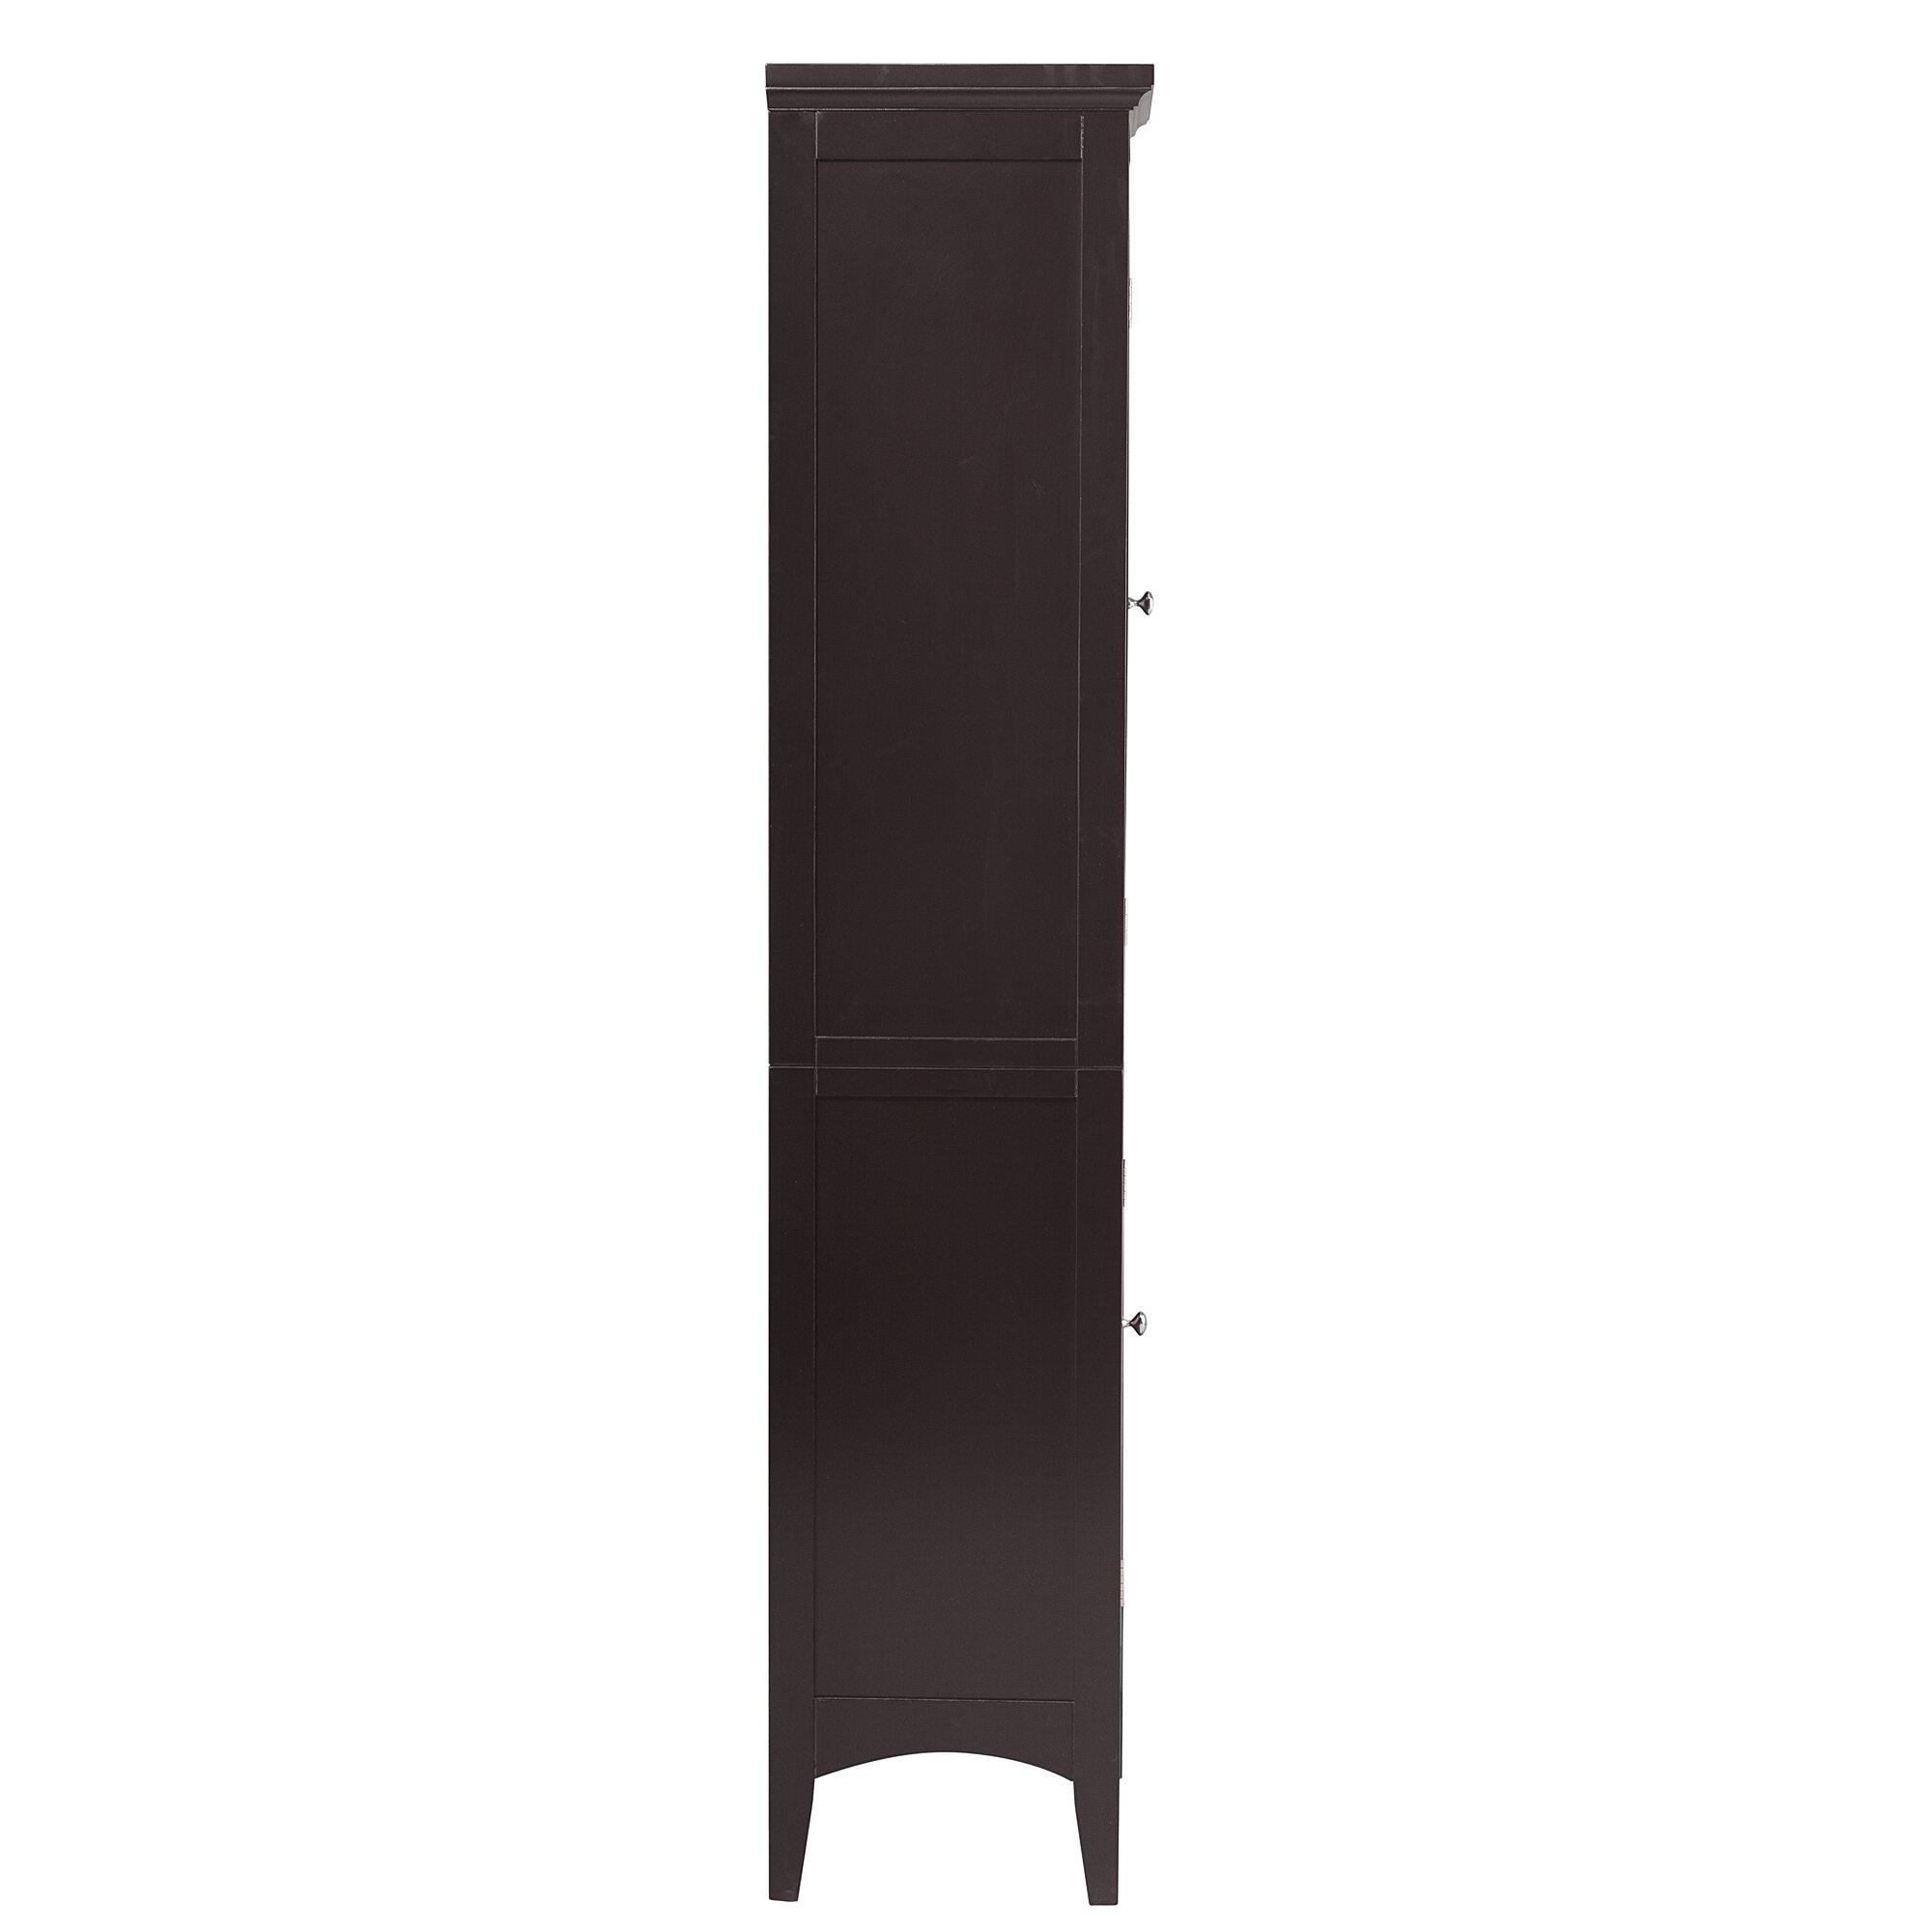 Small Wall Hung Bathroom Cabinet Slim. Slimline Wall Mounted Bathroom Cabinets   Cabinet biji us